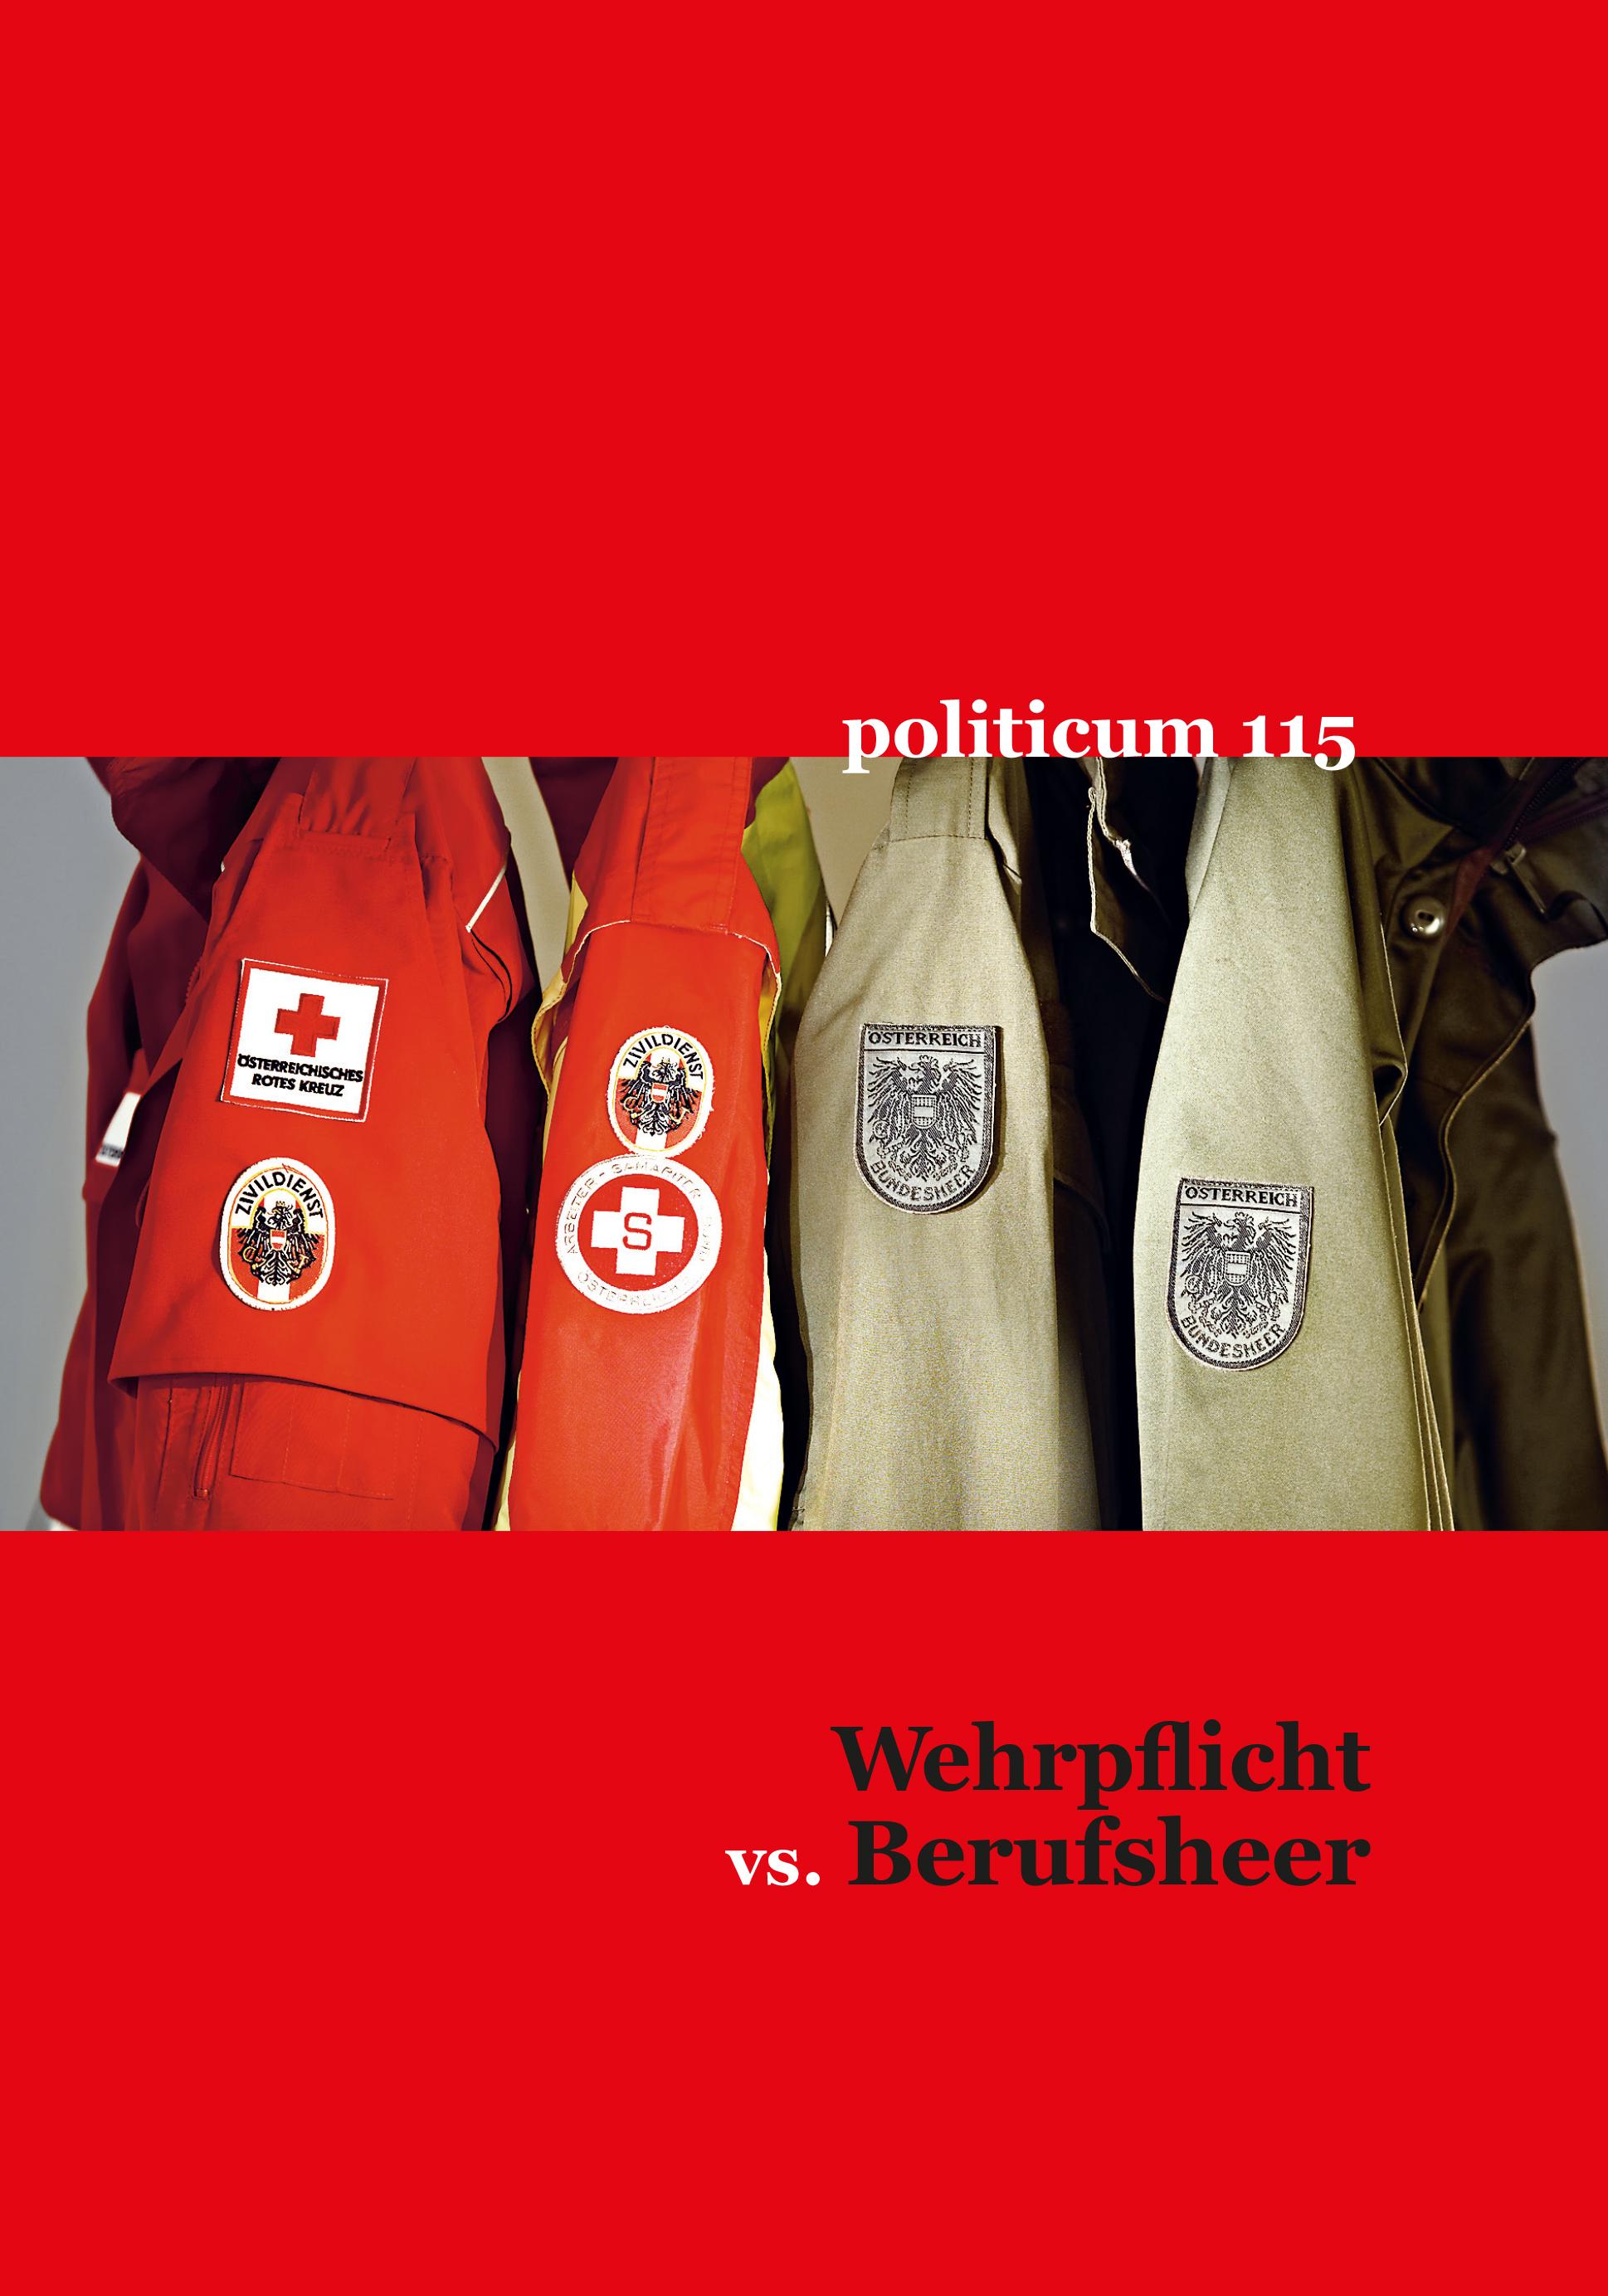 stvp12_politicum-115_cov.indd